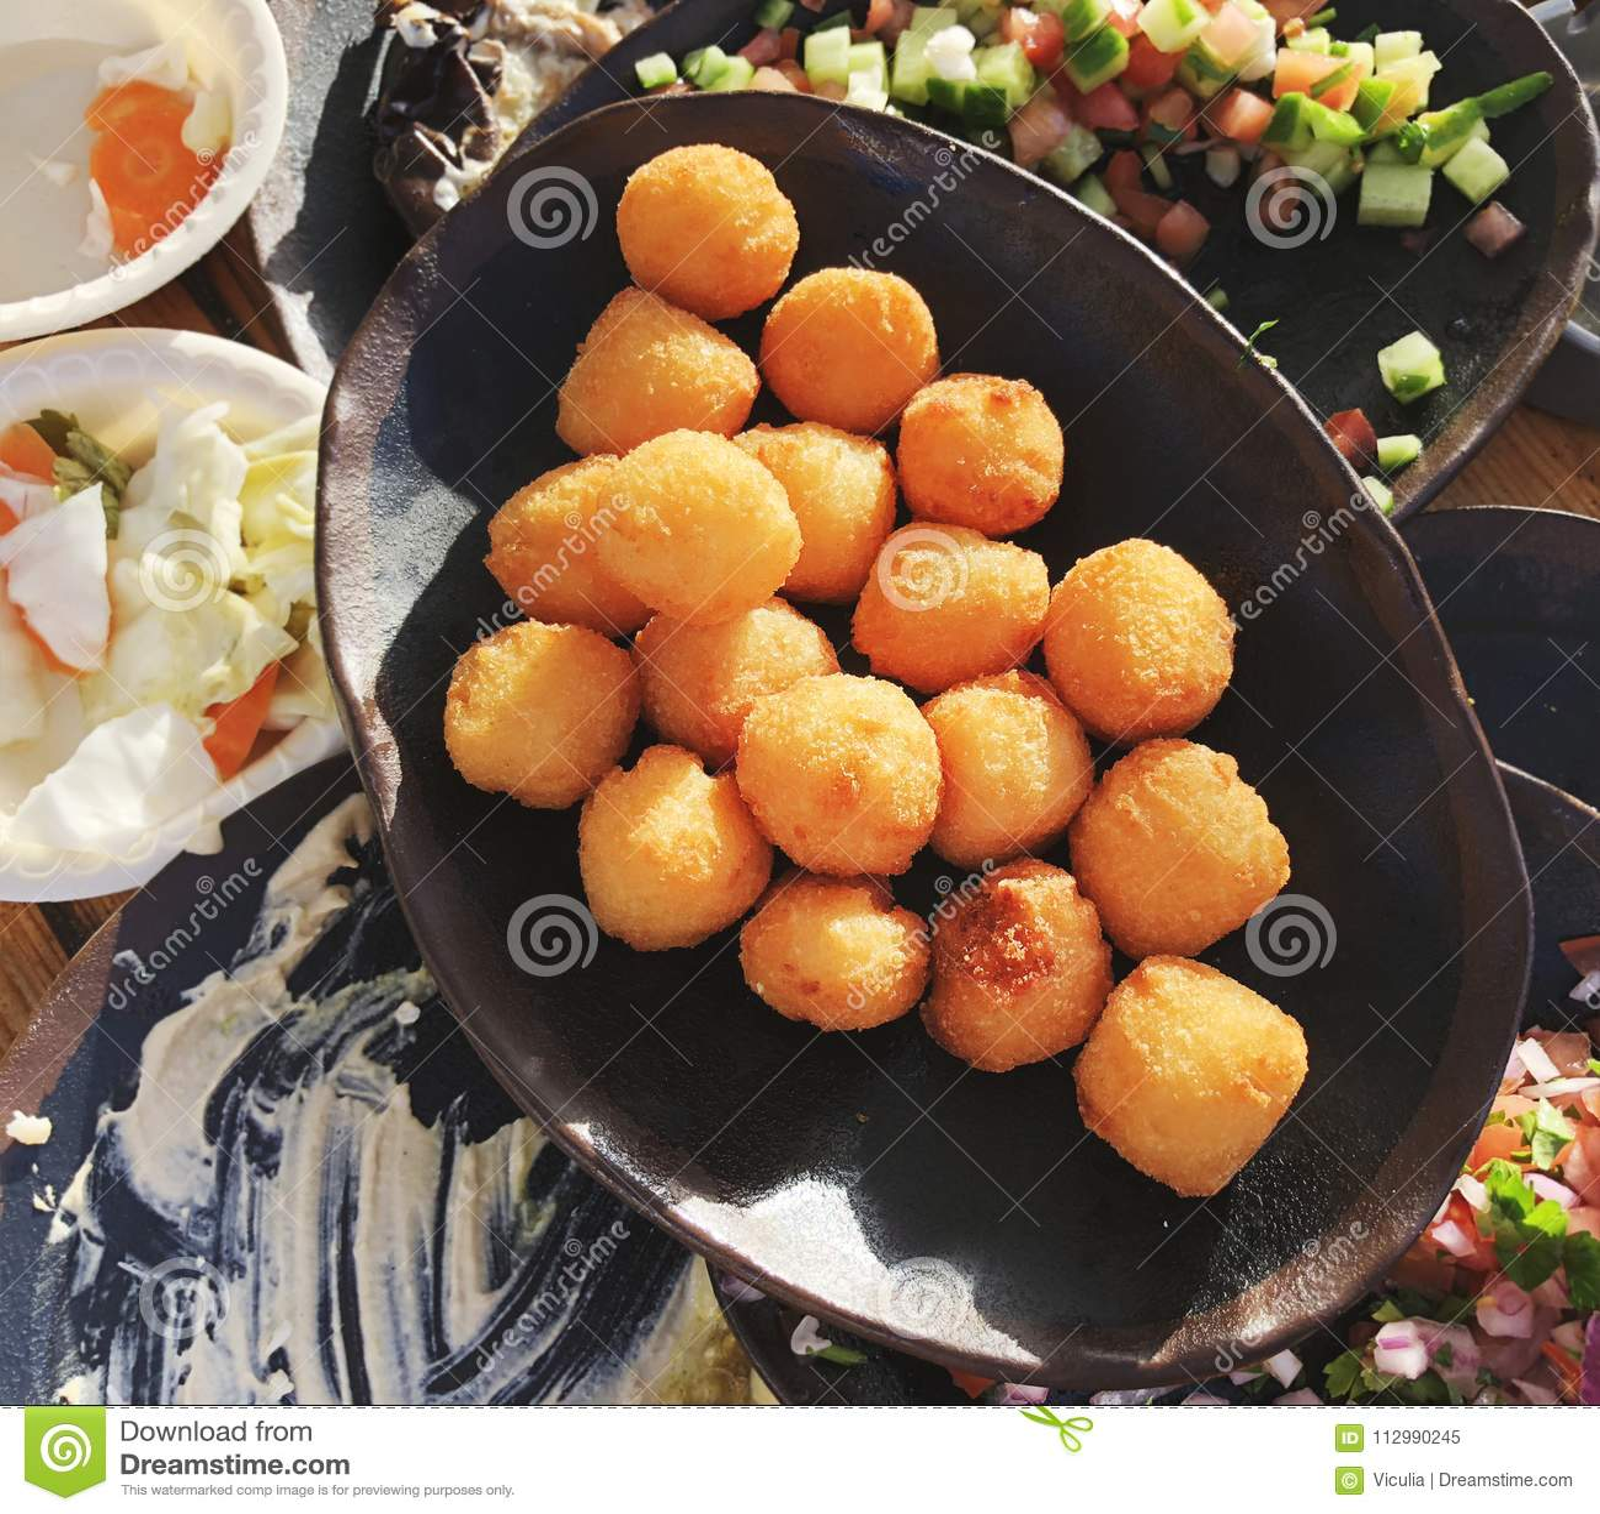 Close up of frieds sweet potato balls on plate.